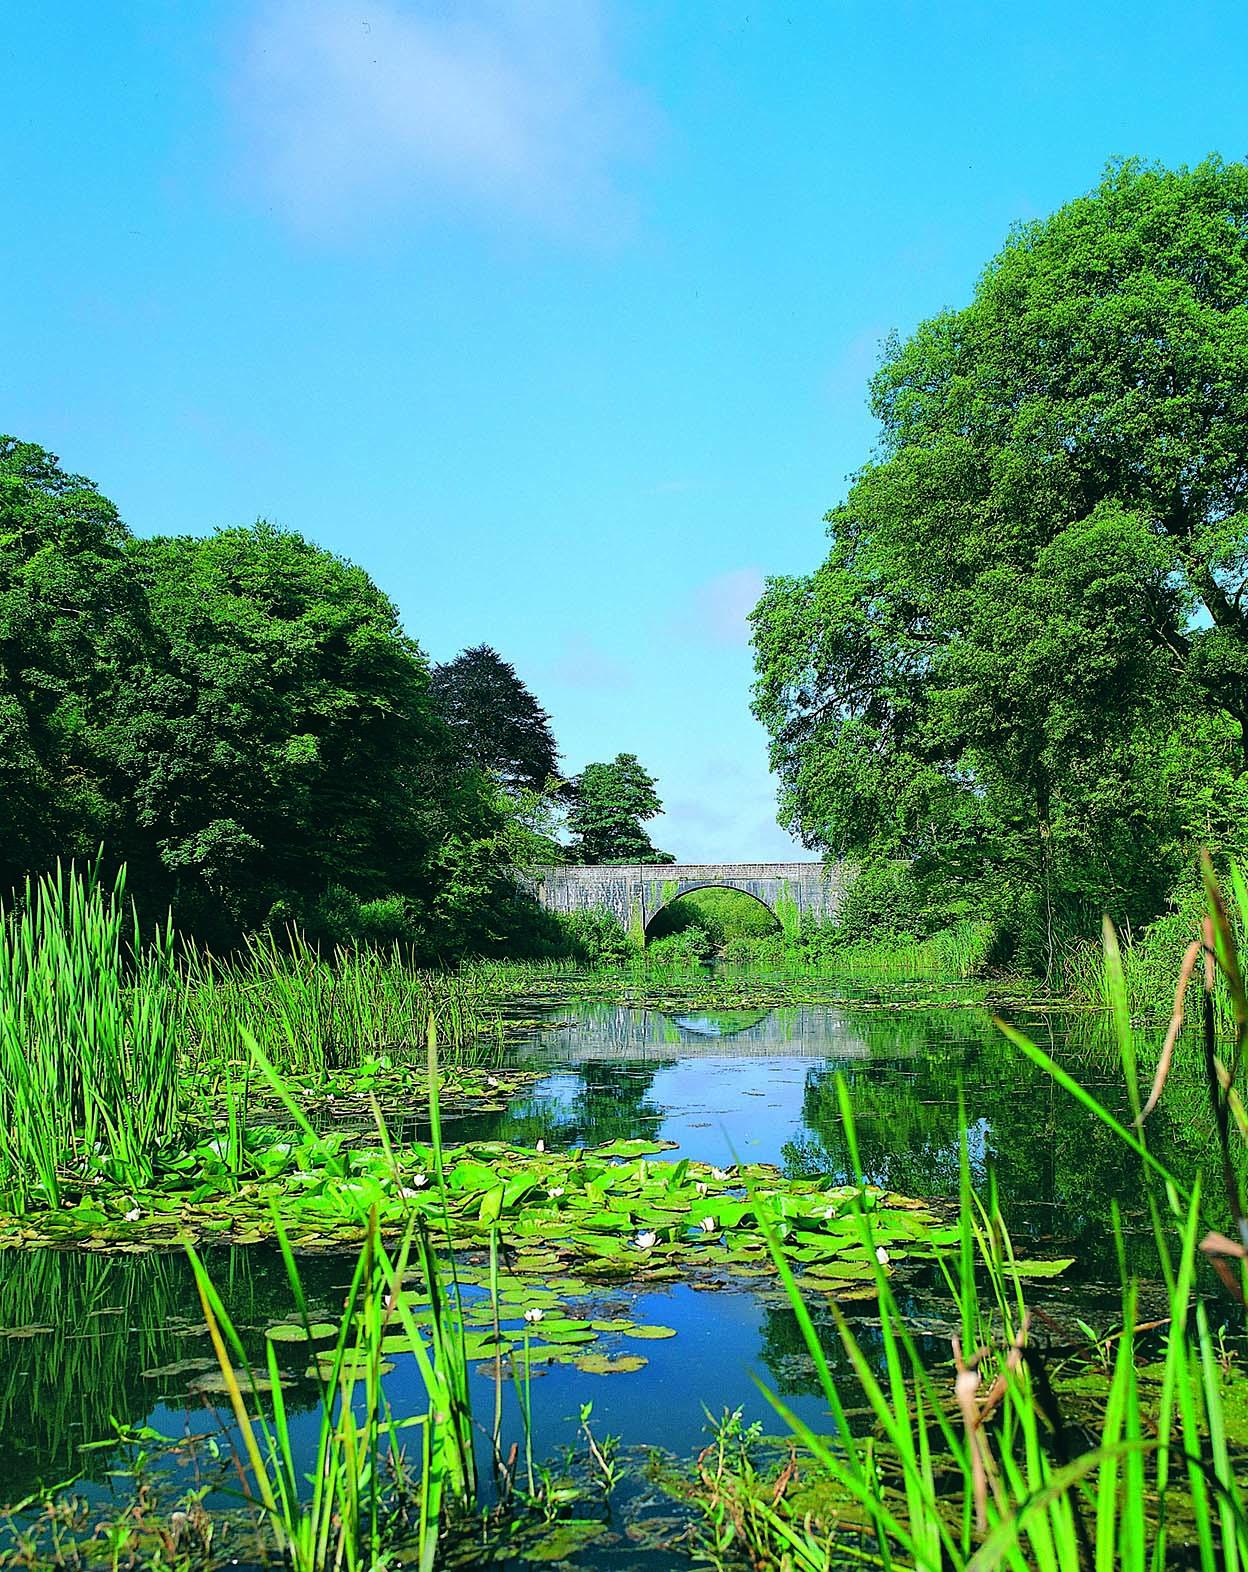 Bosherton Lily Ponds, Stackpole Estate